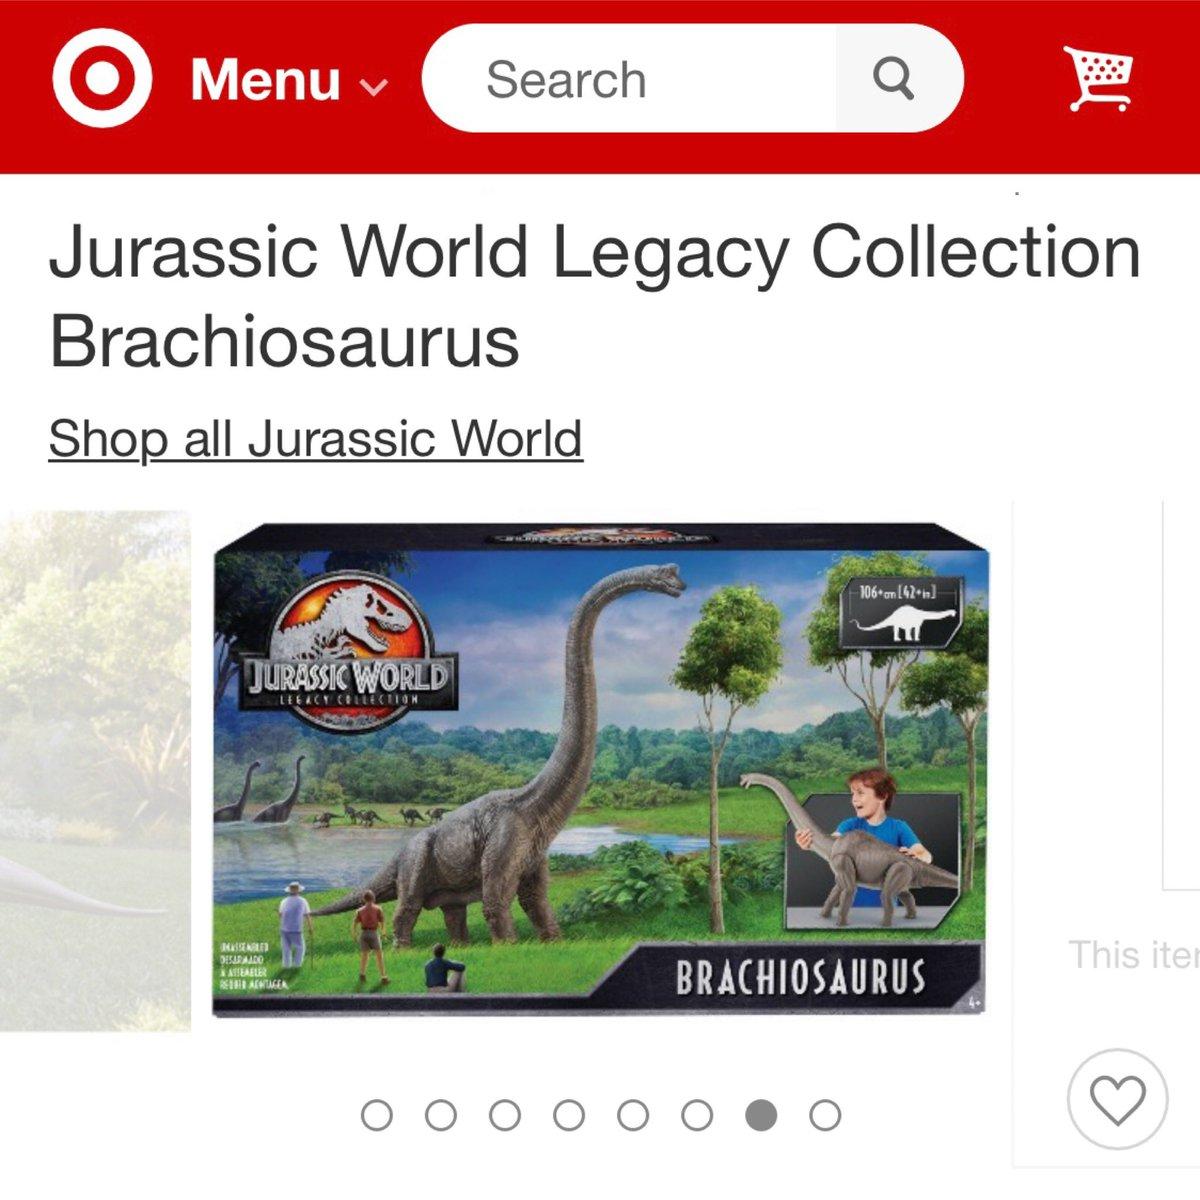 Jurassic Outpost (@JurassicOutpost) | Twitter